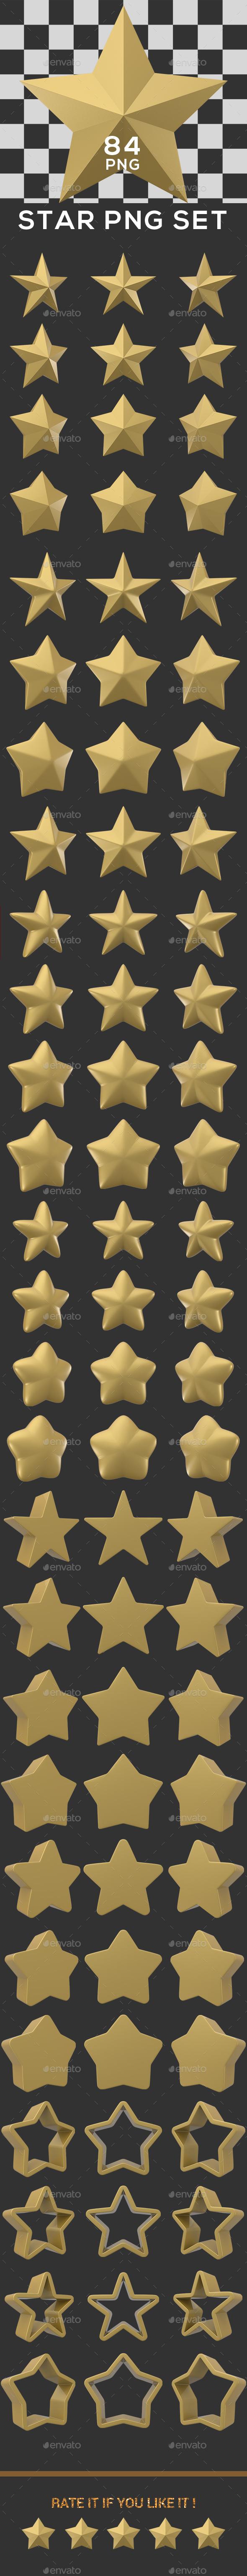 Star PNG Set - 3D Renders Graphics